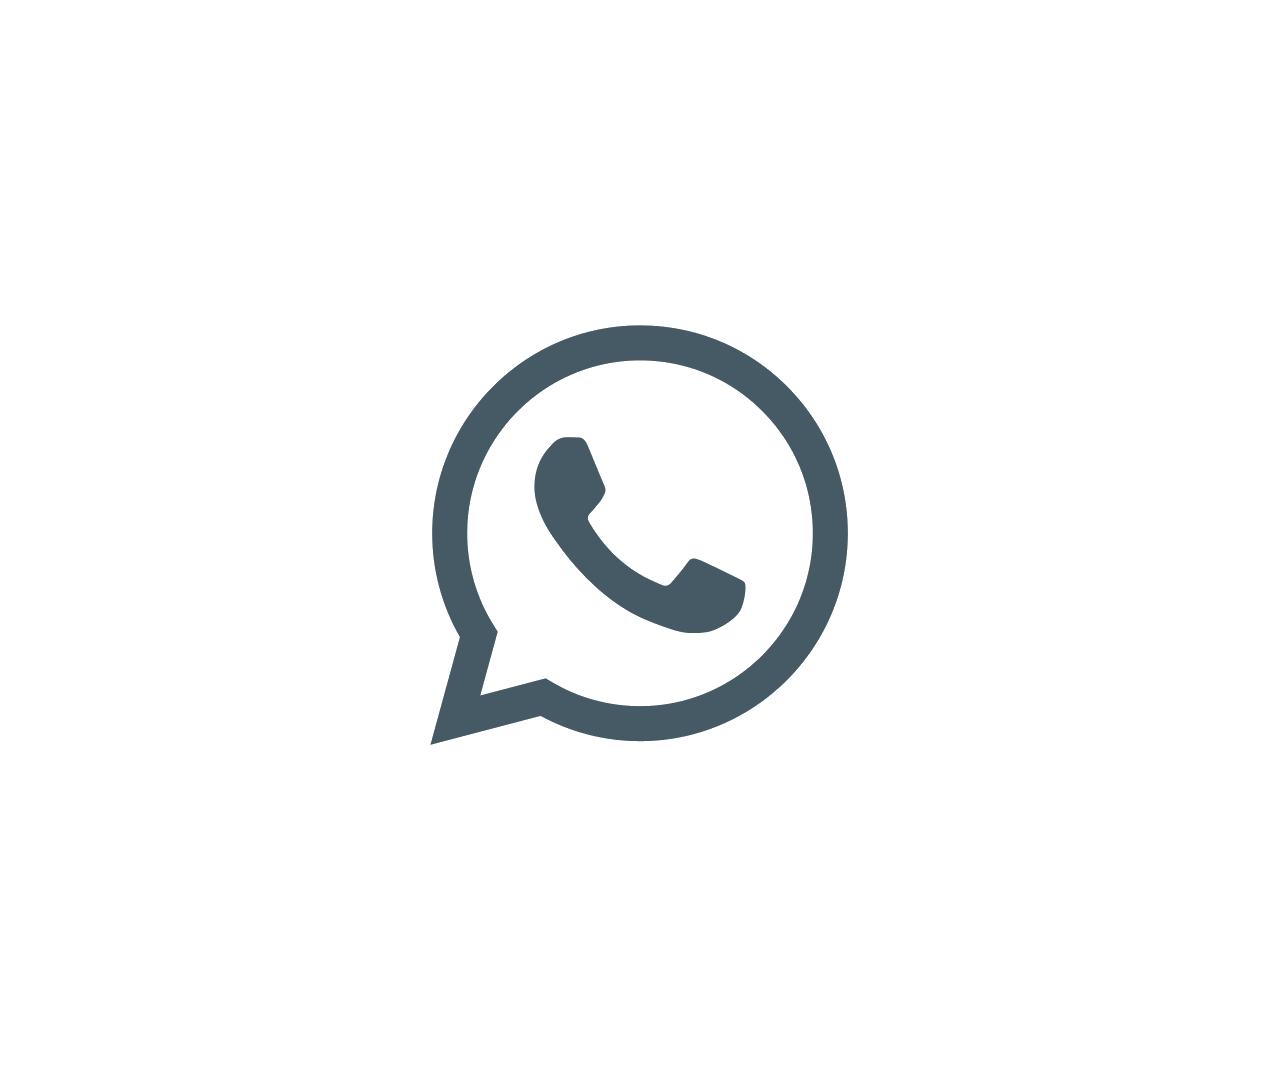 Send me a WhatsApp message!